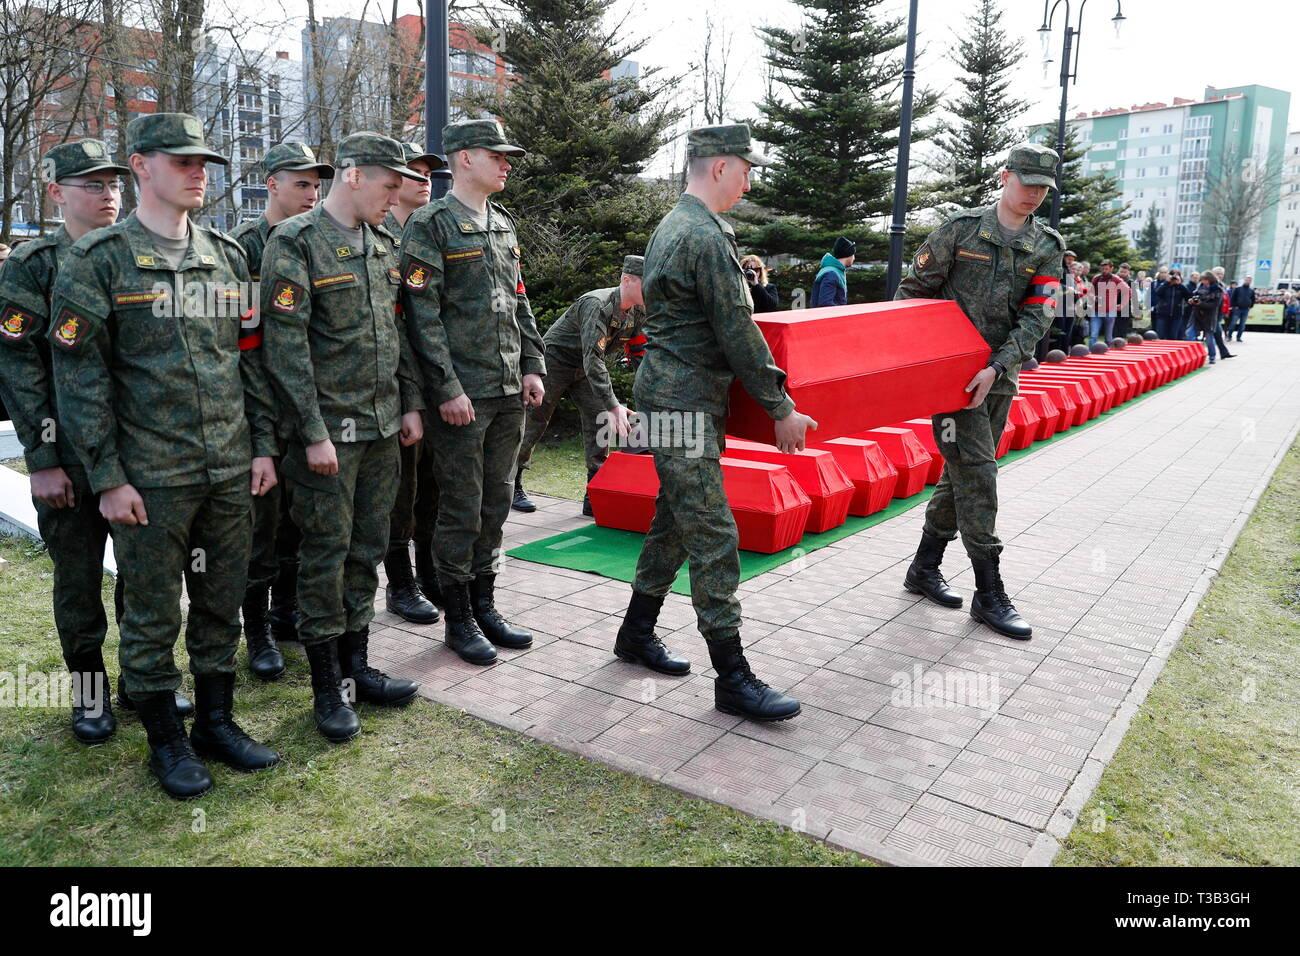 Kaliningrader Dating-AgenturenJohn n datiert ukraine